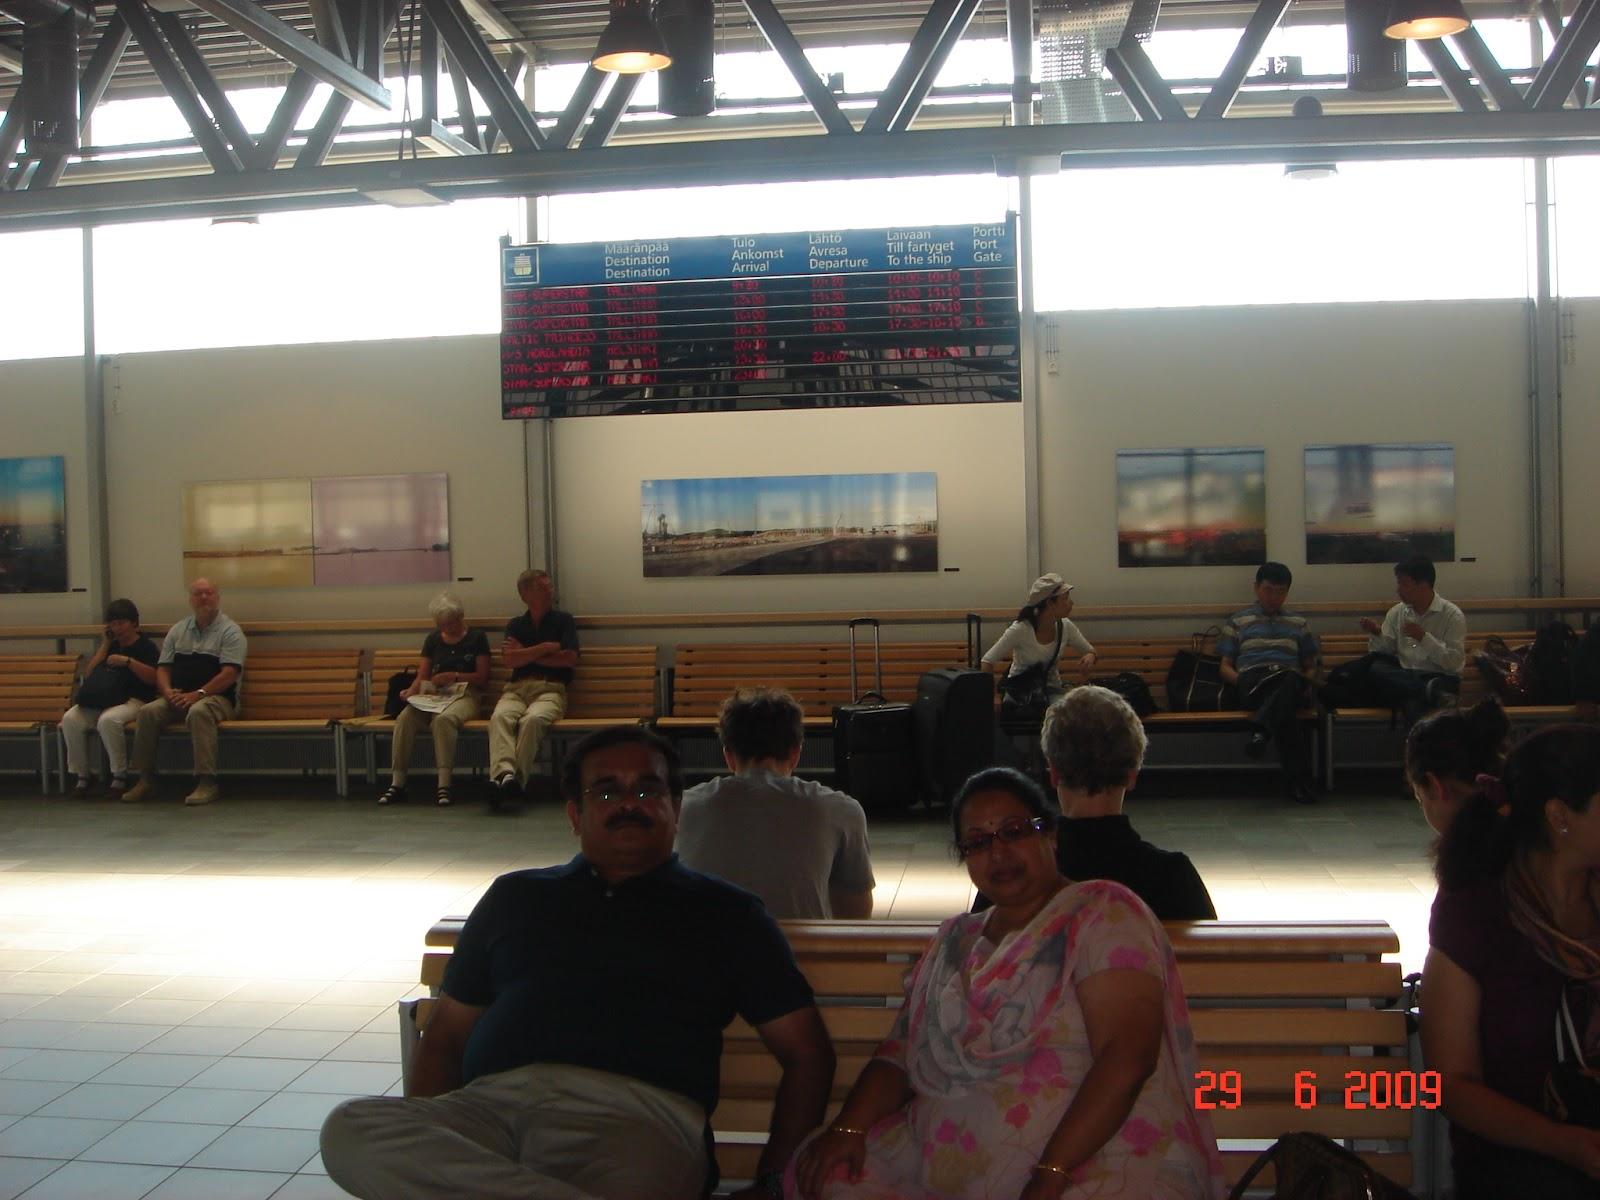 Boarding terminal at Helsinki for M/S Tallink Superstar to Tallinn